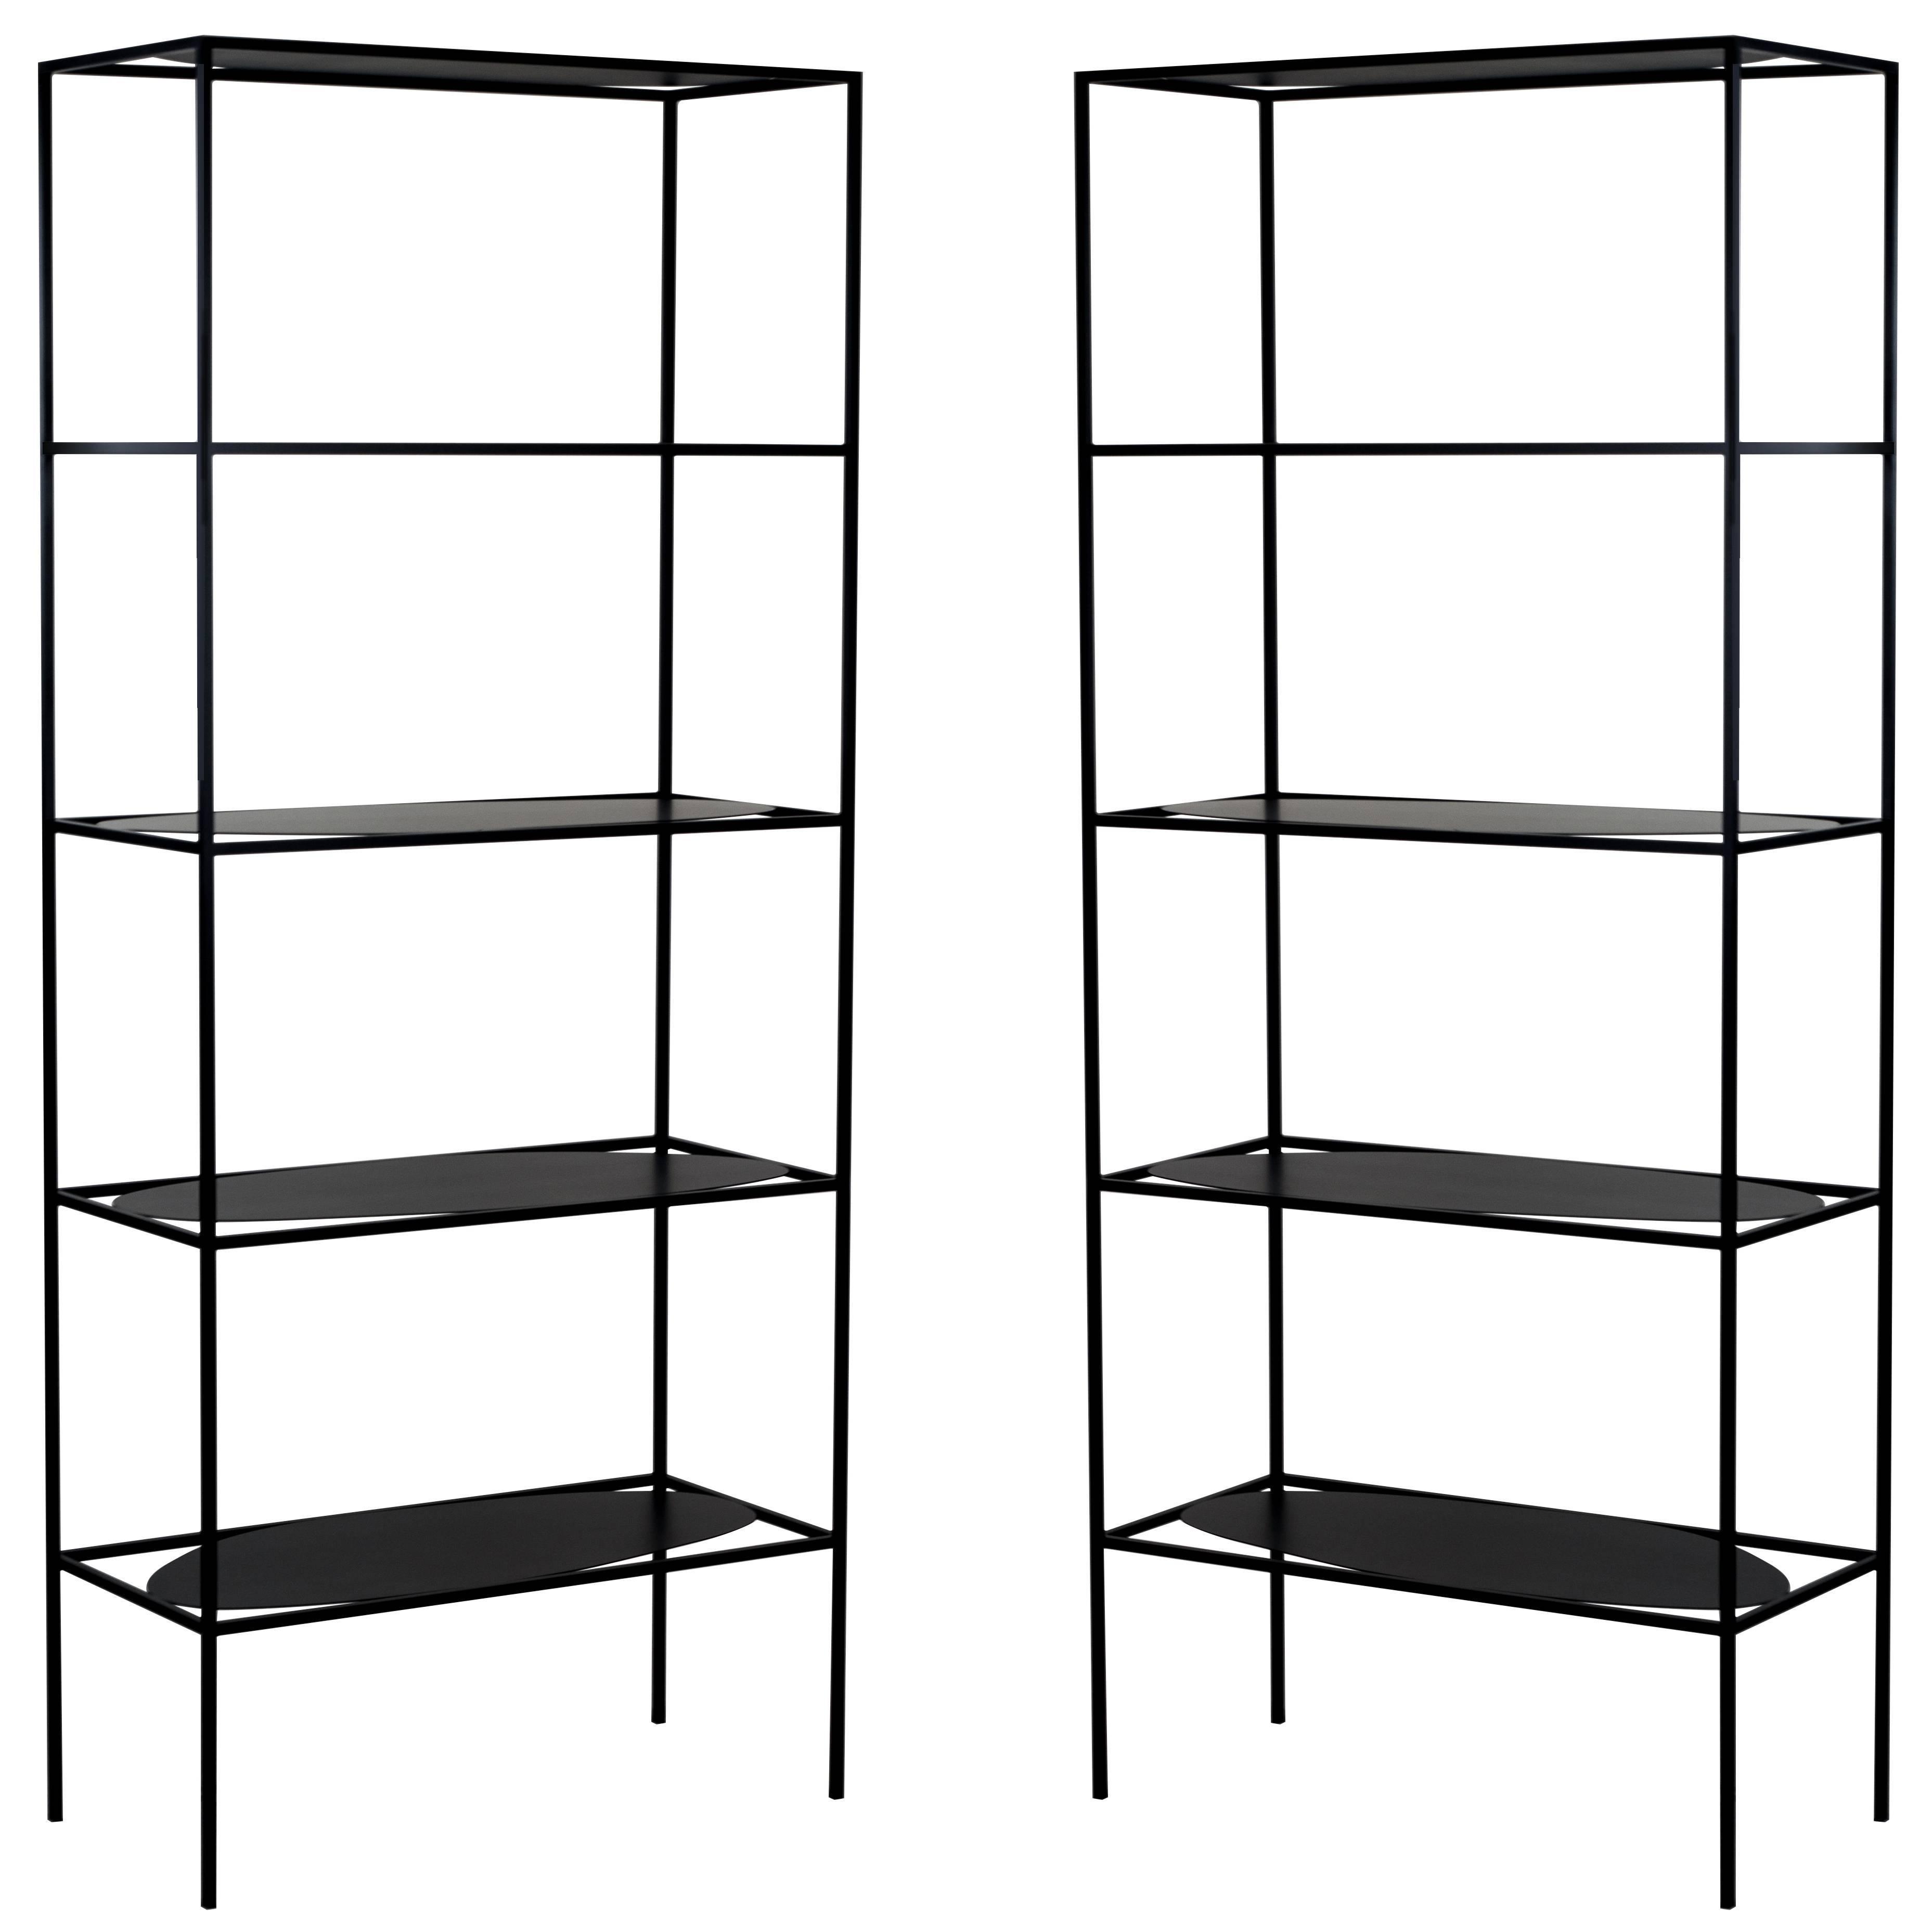 Contemporary Sculptural Black Steel Etagere Bookcase Storage Shelf Pair, USA